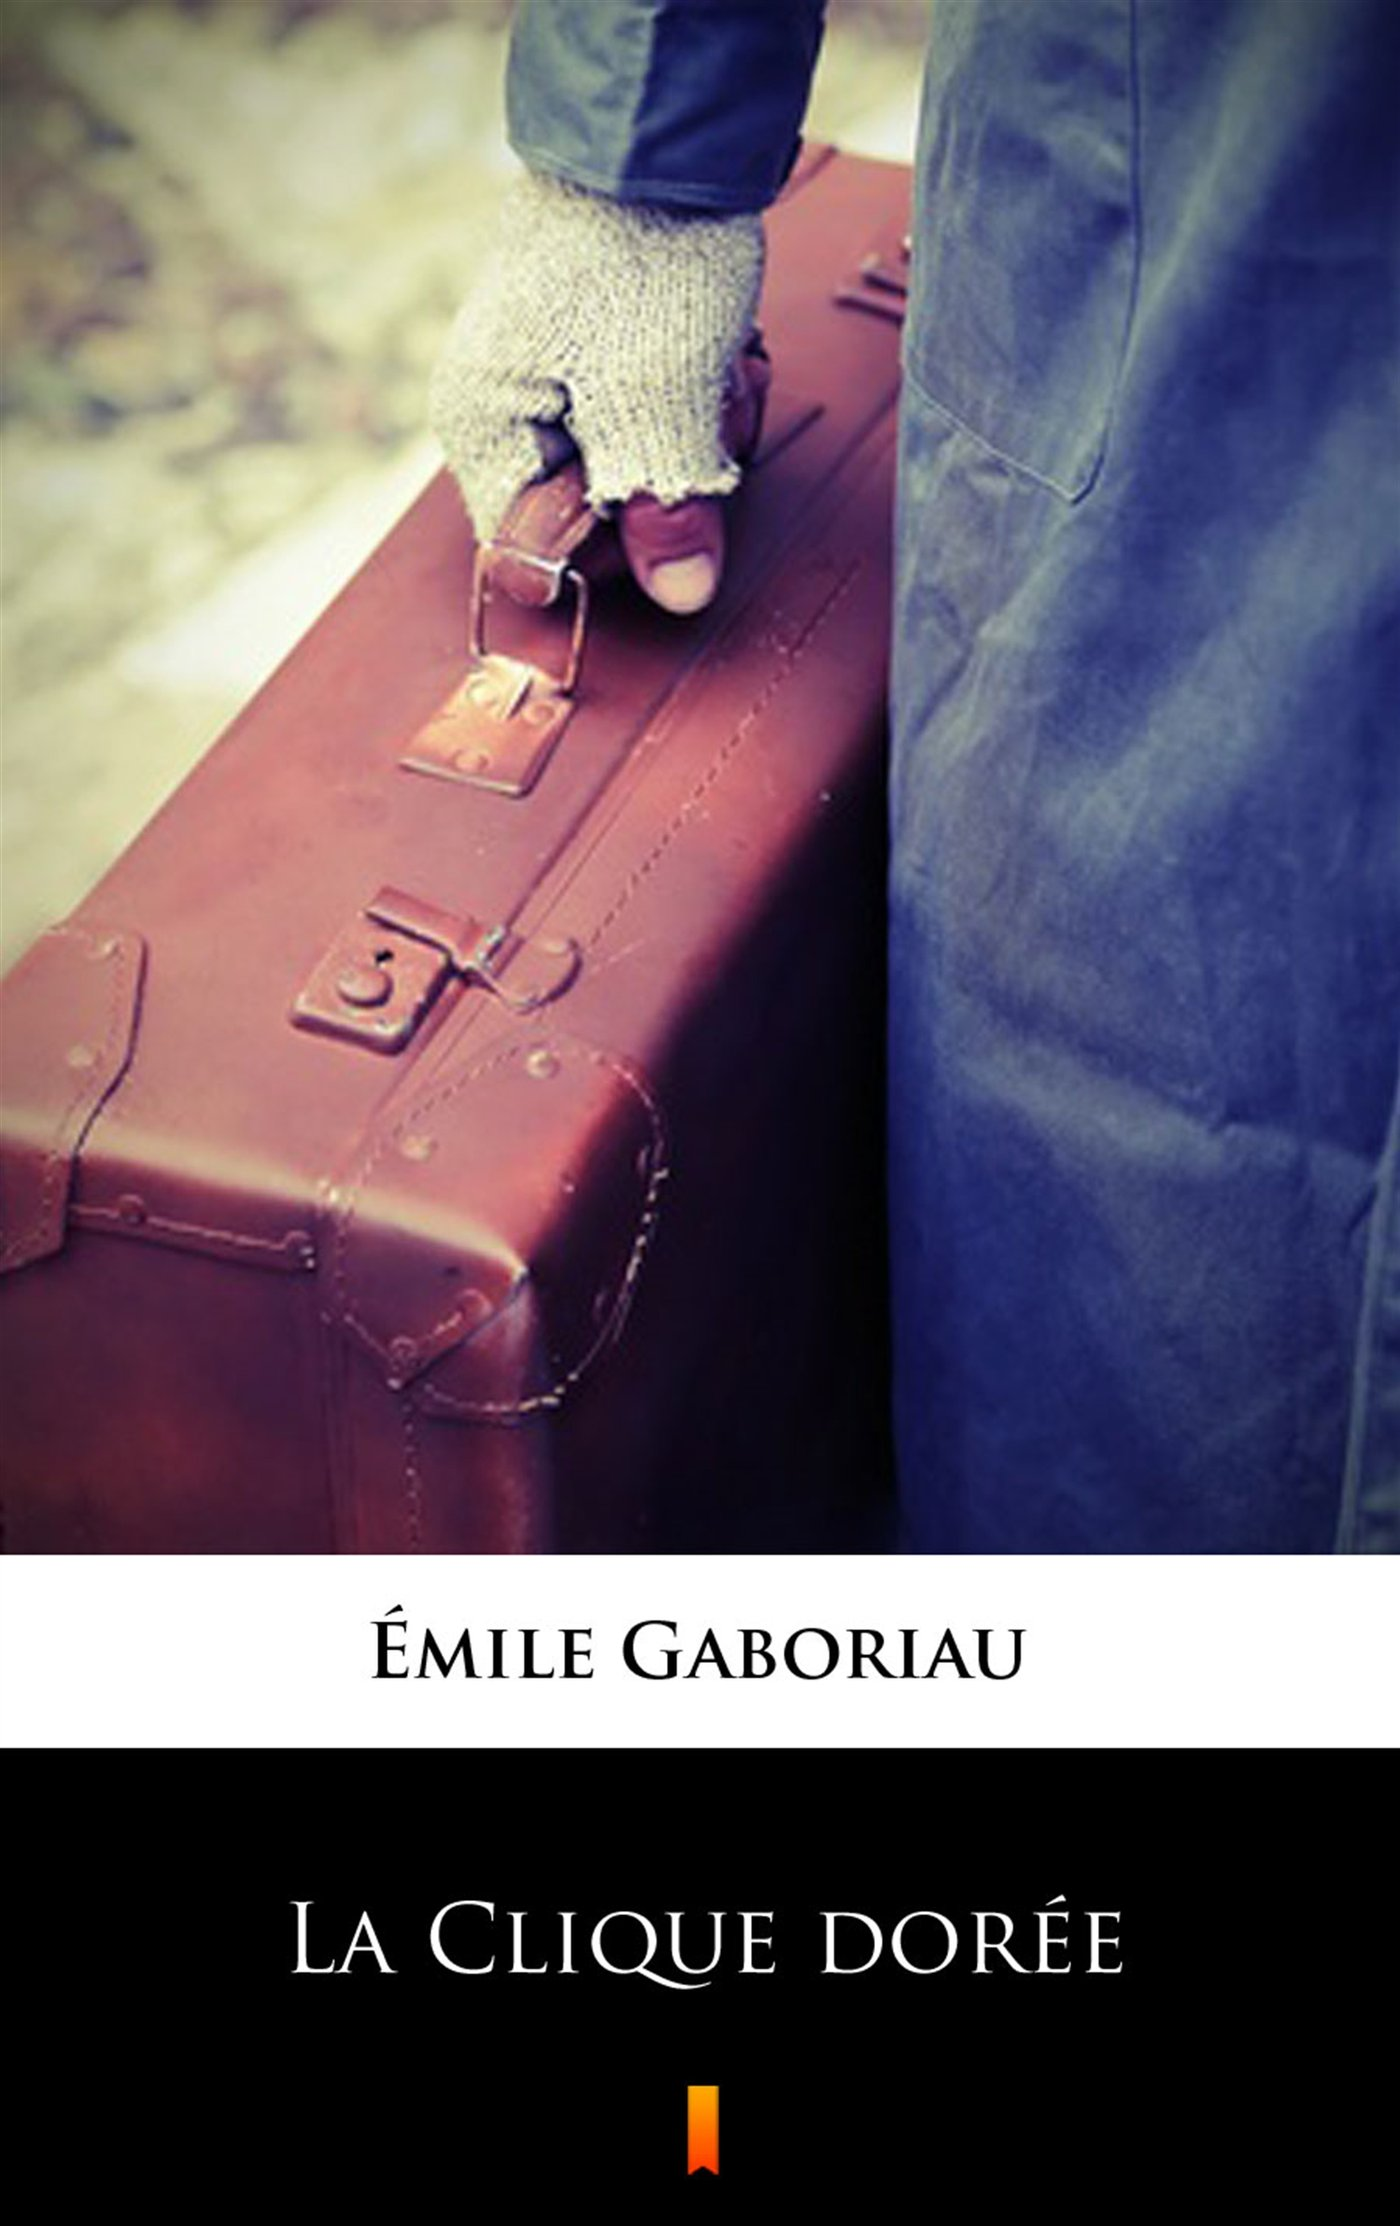 La Clique dorée - Ebook (Książka na Kindle) do pobrania w formacie MOBI